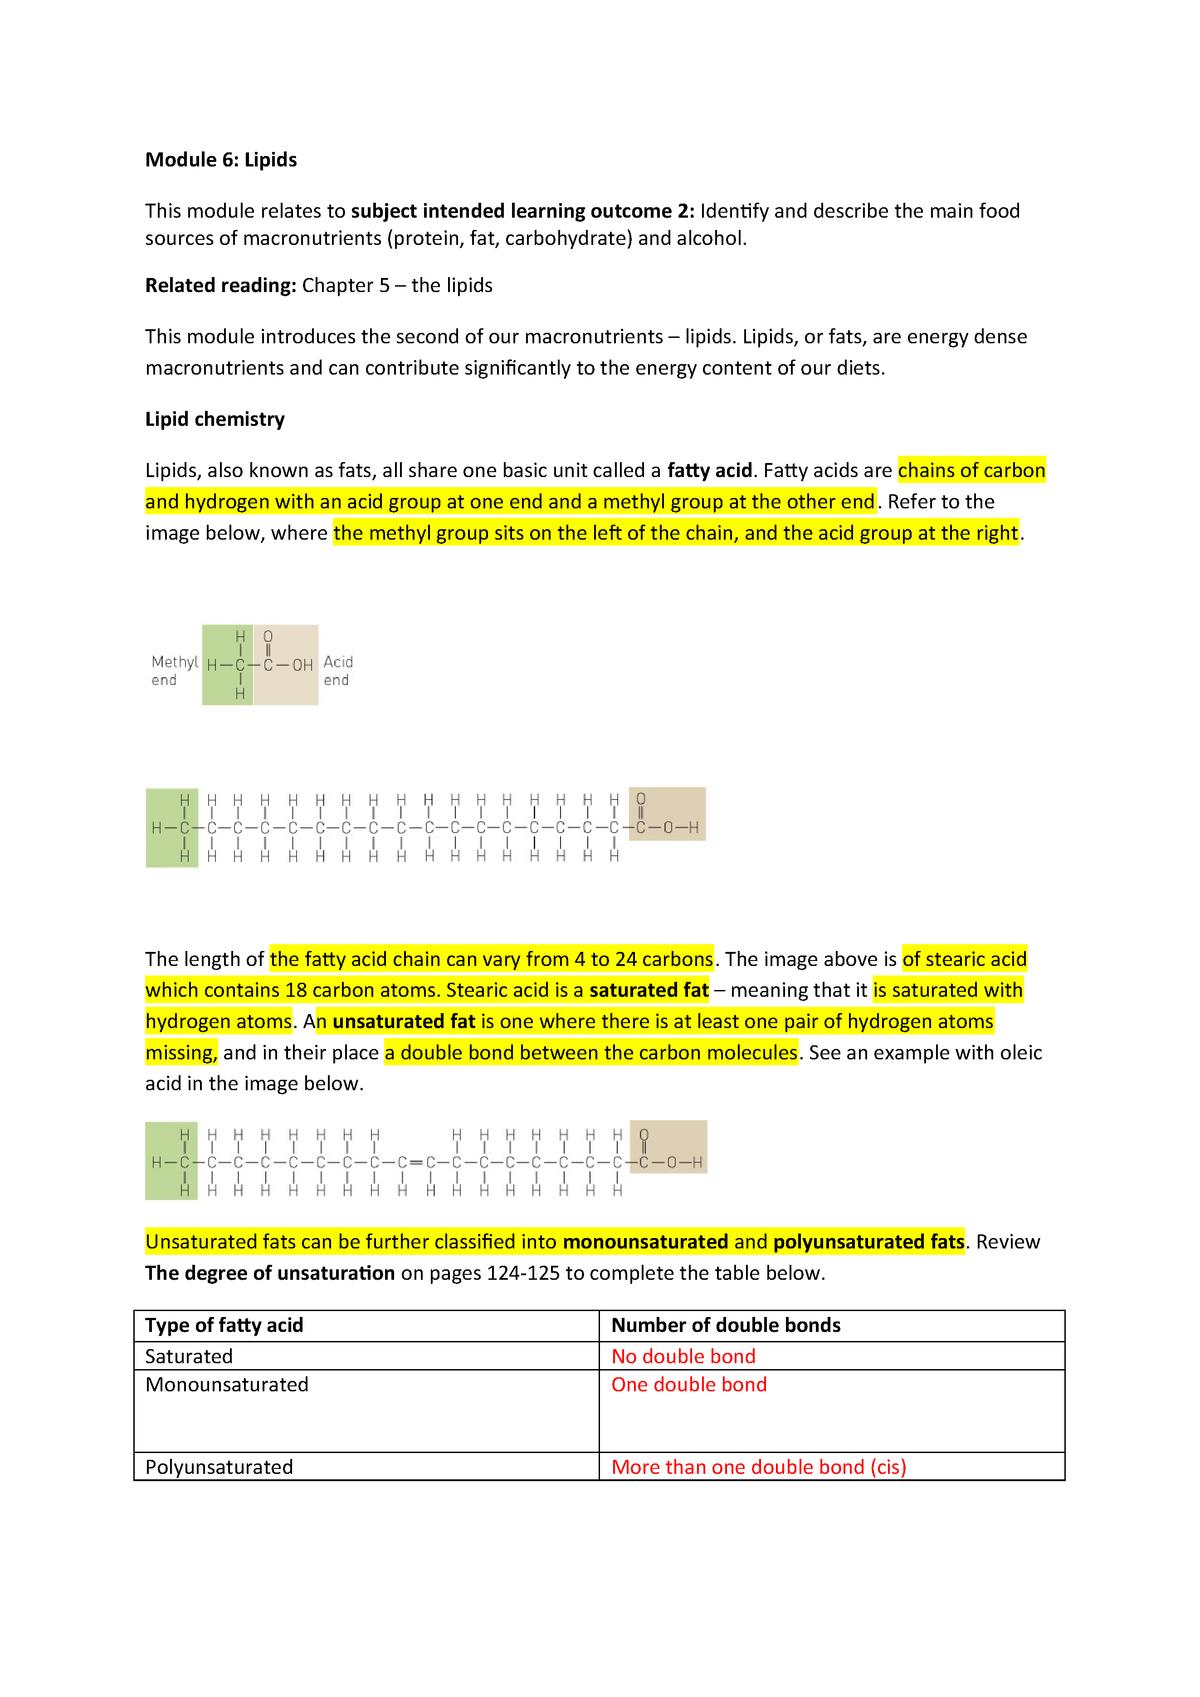 Module 6 Lipids - DTN1NHW: Introduction To Nutrition - StuDocu